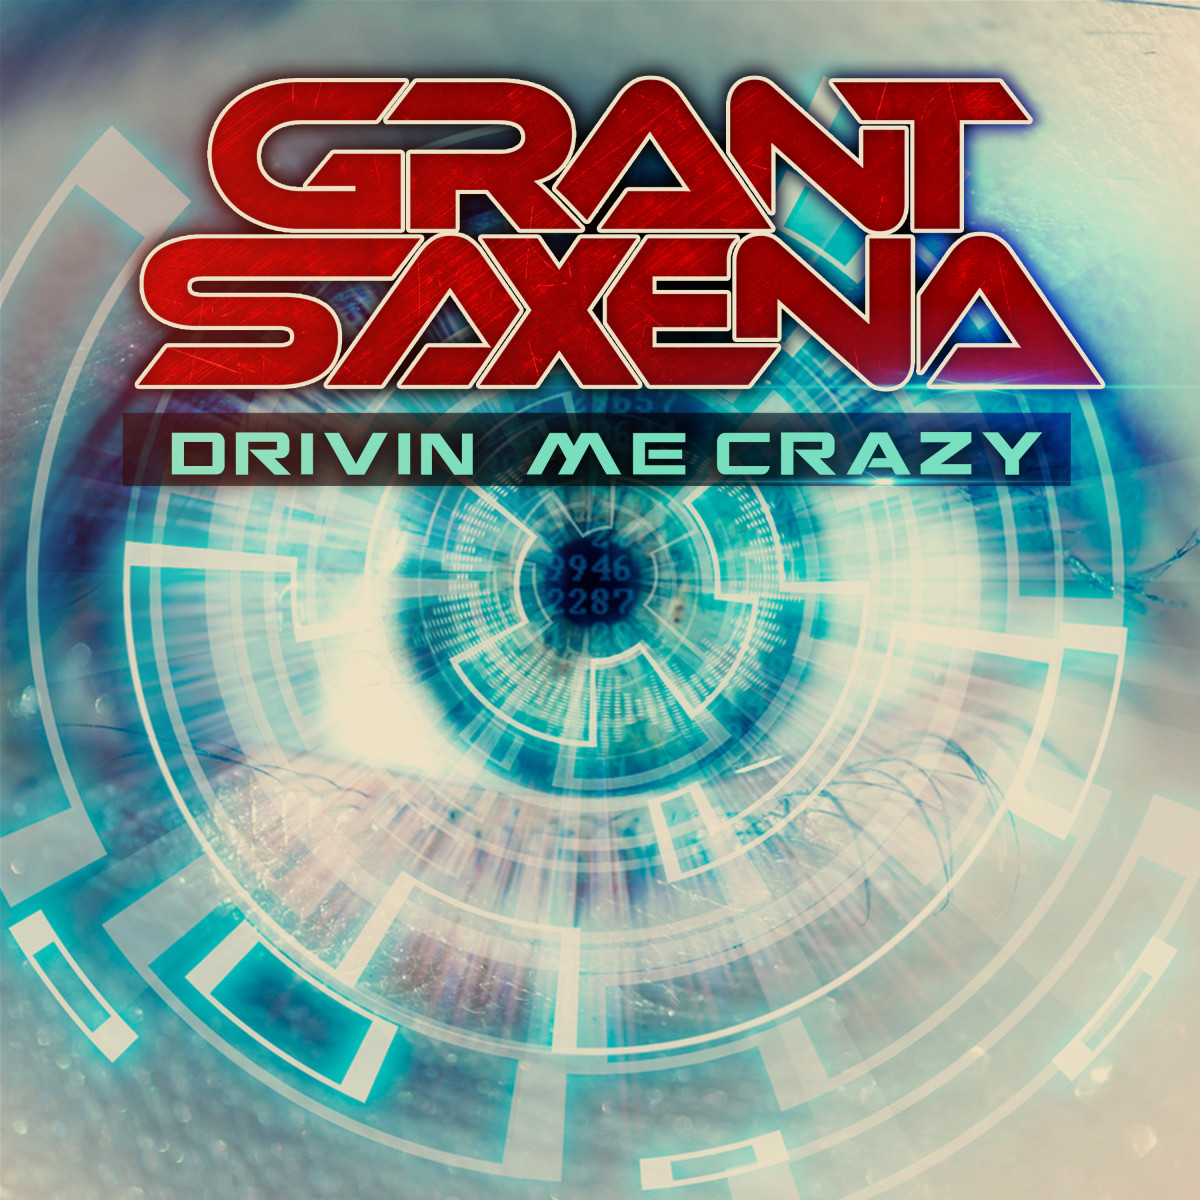 Grant Saxena (DJ Sax) - Drivin Me Crazy (ALBUM ARTWORK)